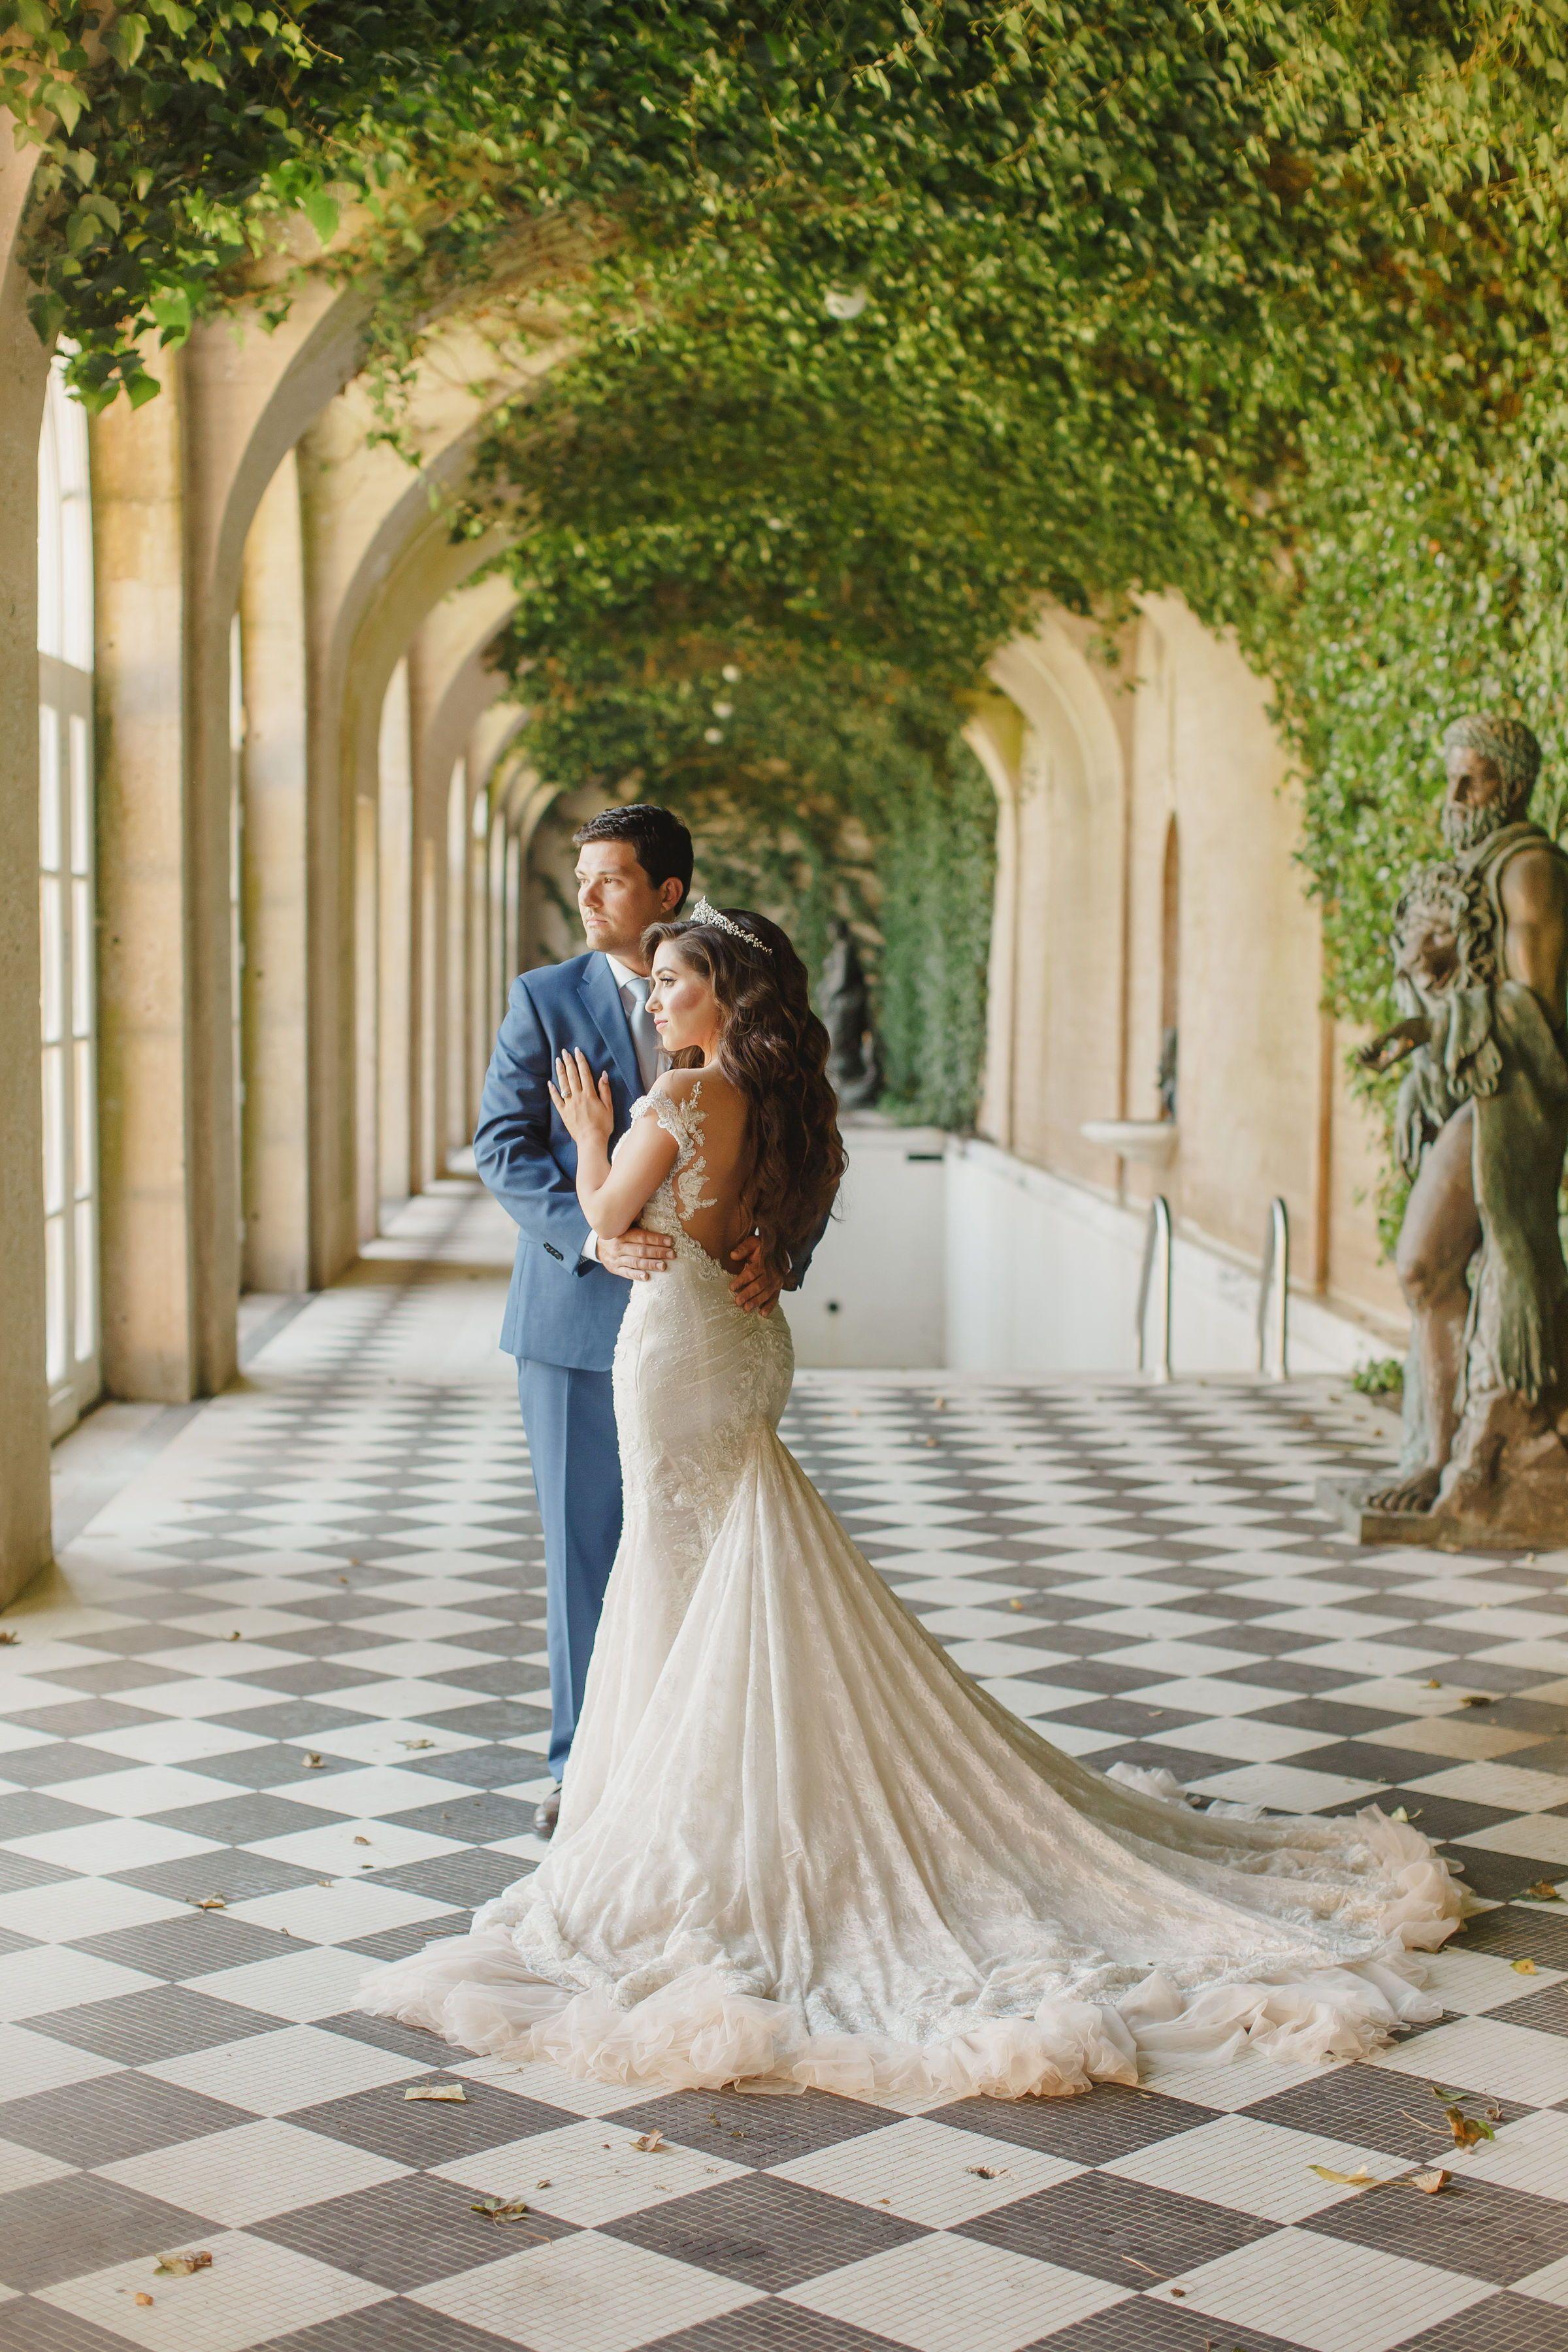 Luxury Fairytale Wedding At Oheka Castle Wedding Venue In Long Island Ny Galia Lahav Bridal Bridal Gown Inspiration Galia Lahav Wedding Gowns Wedding Photos